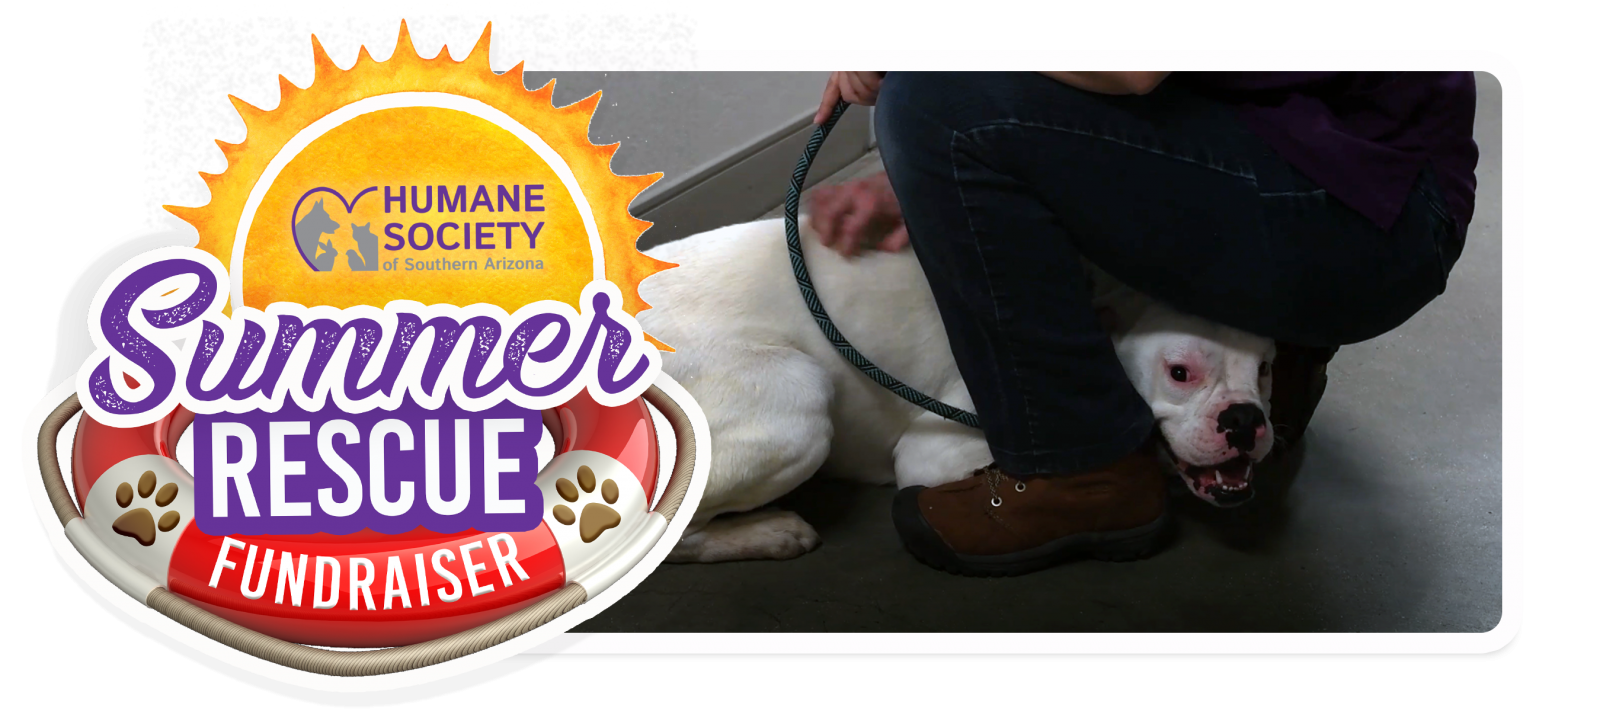 Summer Rescue Fundraiser Email Header Template - Yogurt